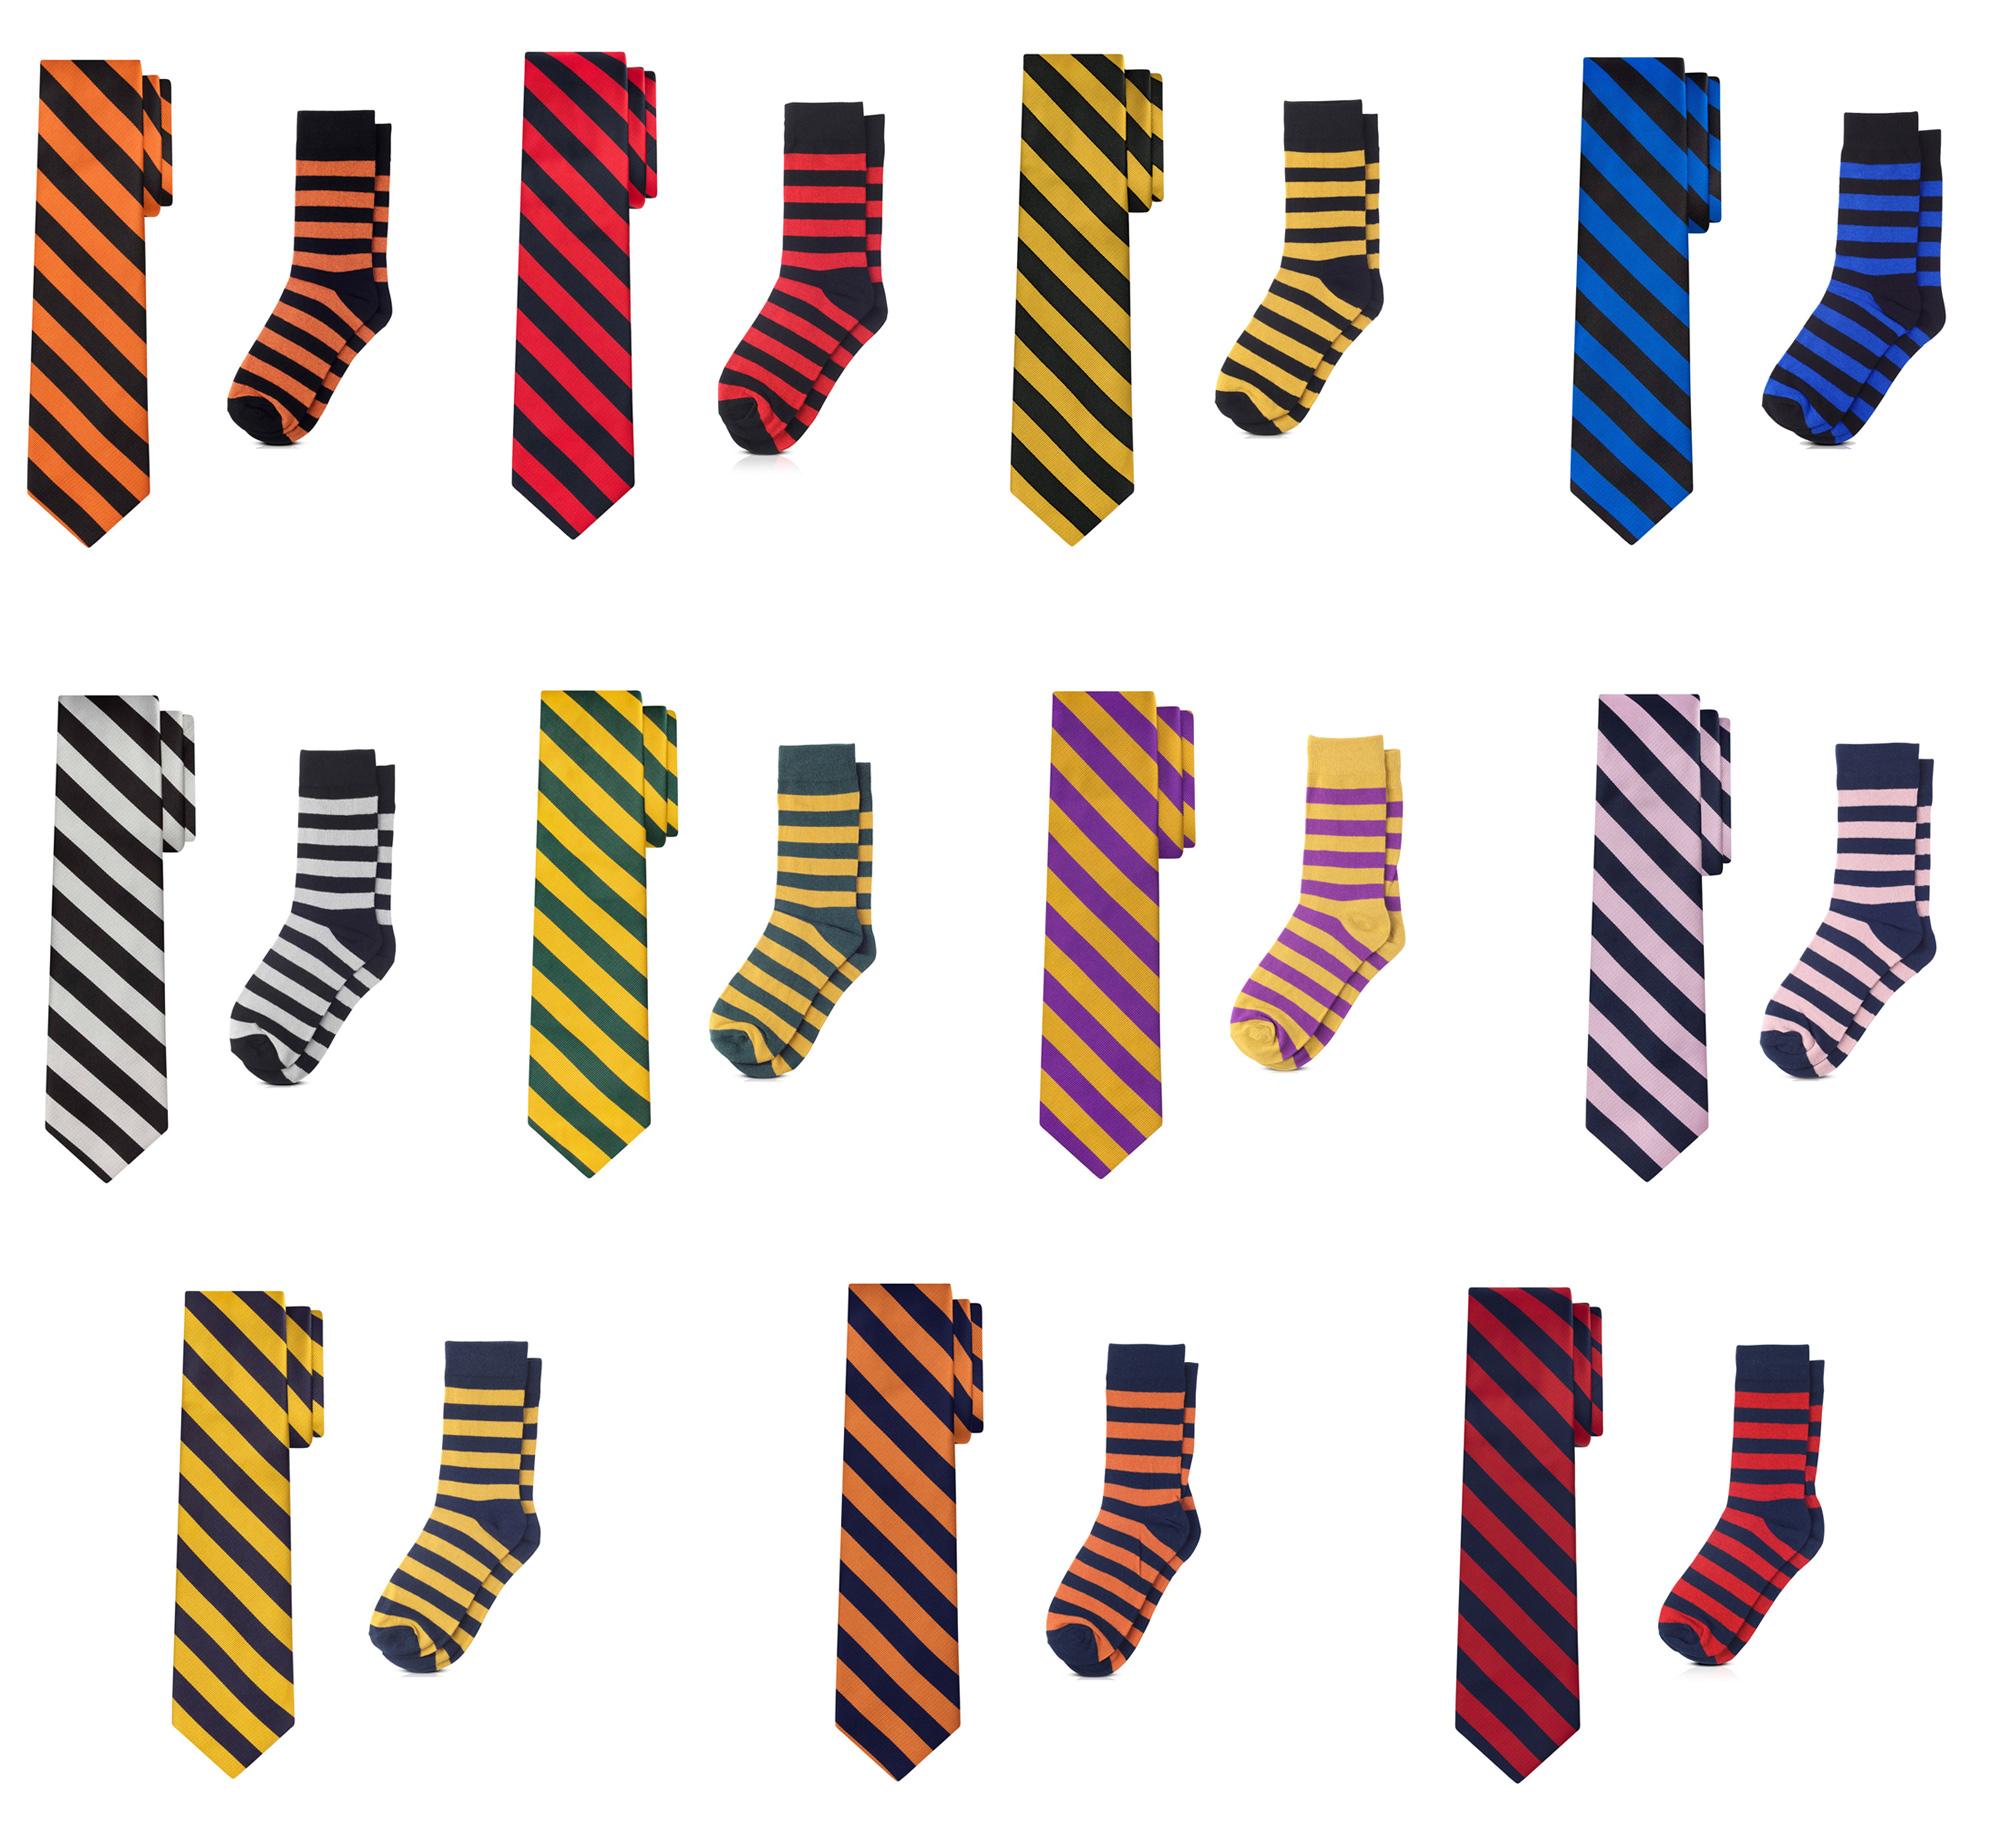 Jacob Alexander Matching College Stripe Dress Socks and Tie